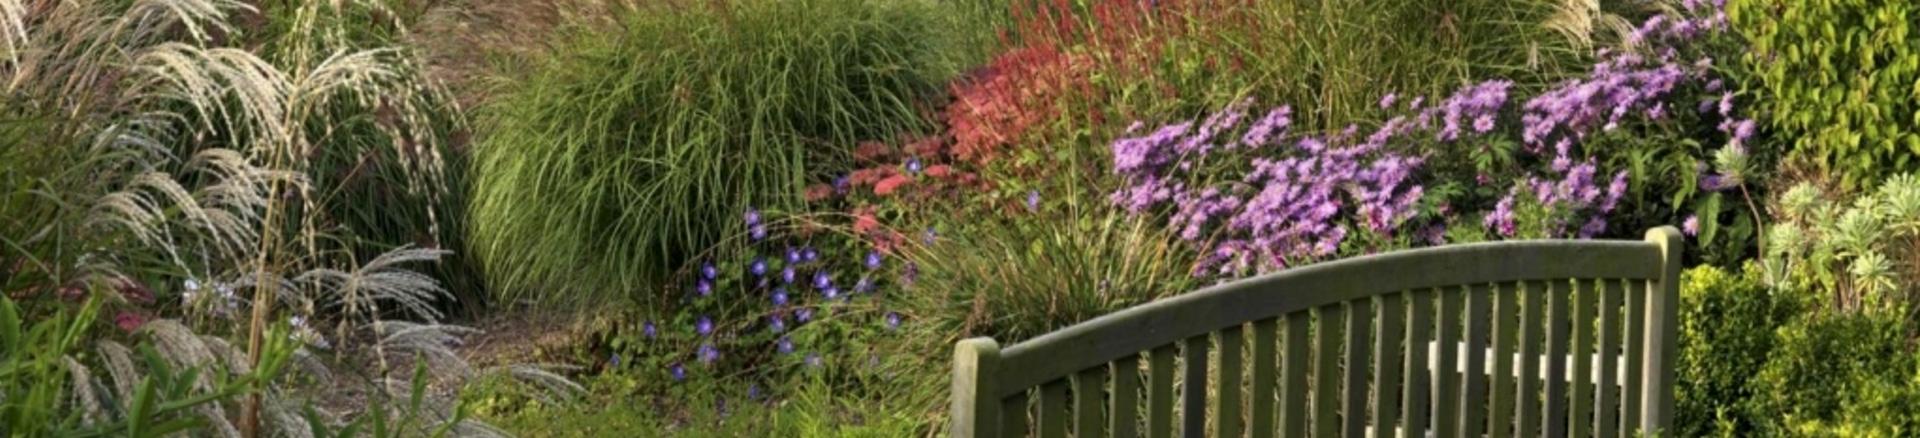 John-Horsey-Horticulture-Garden-Design-Course-Axminster